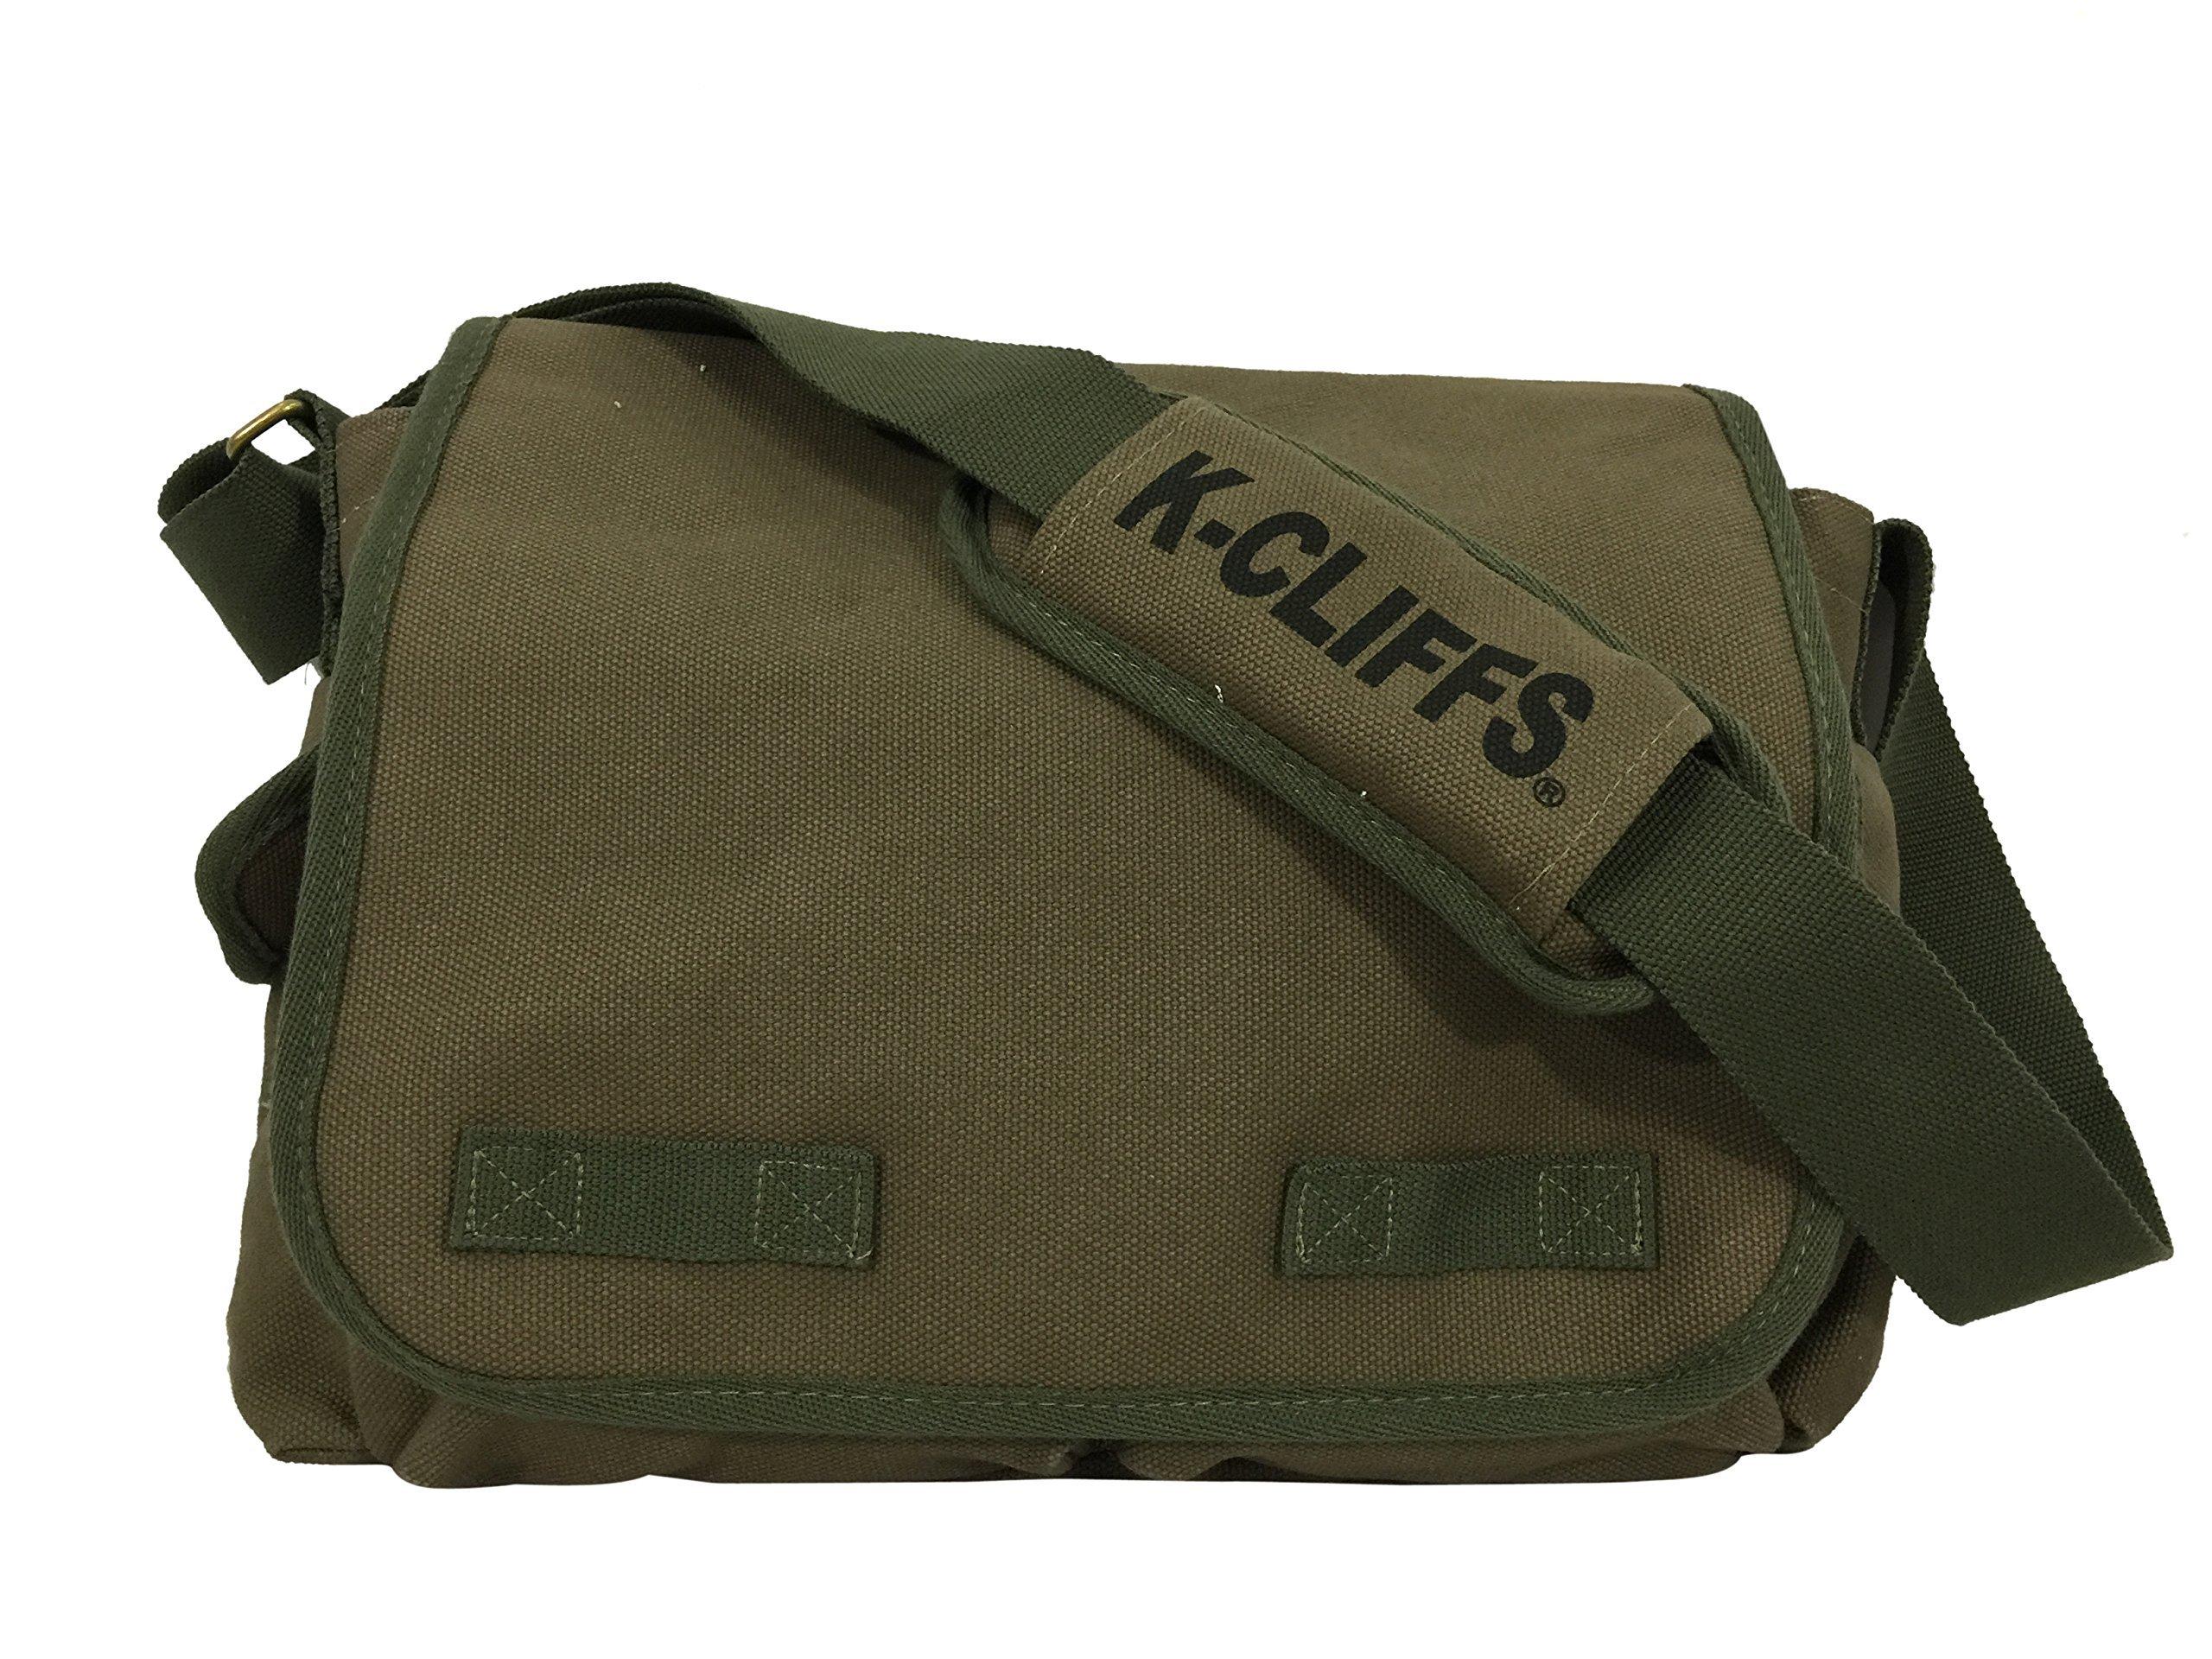 K-Cliffs RT107 Olive Classic Canvas Messenger Bag, Vintage Military Laptop, Heavy Duty